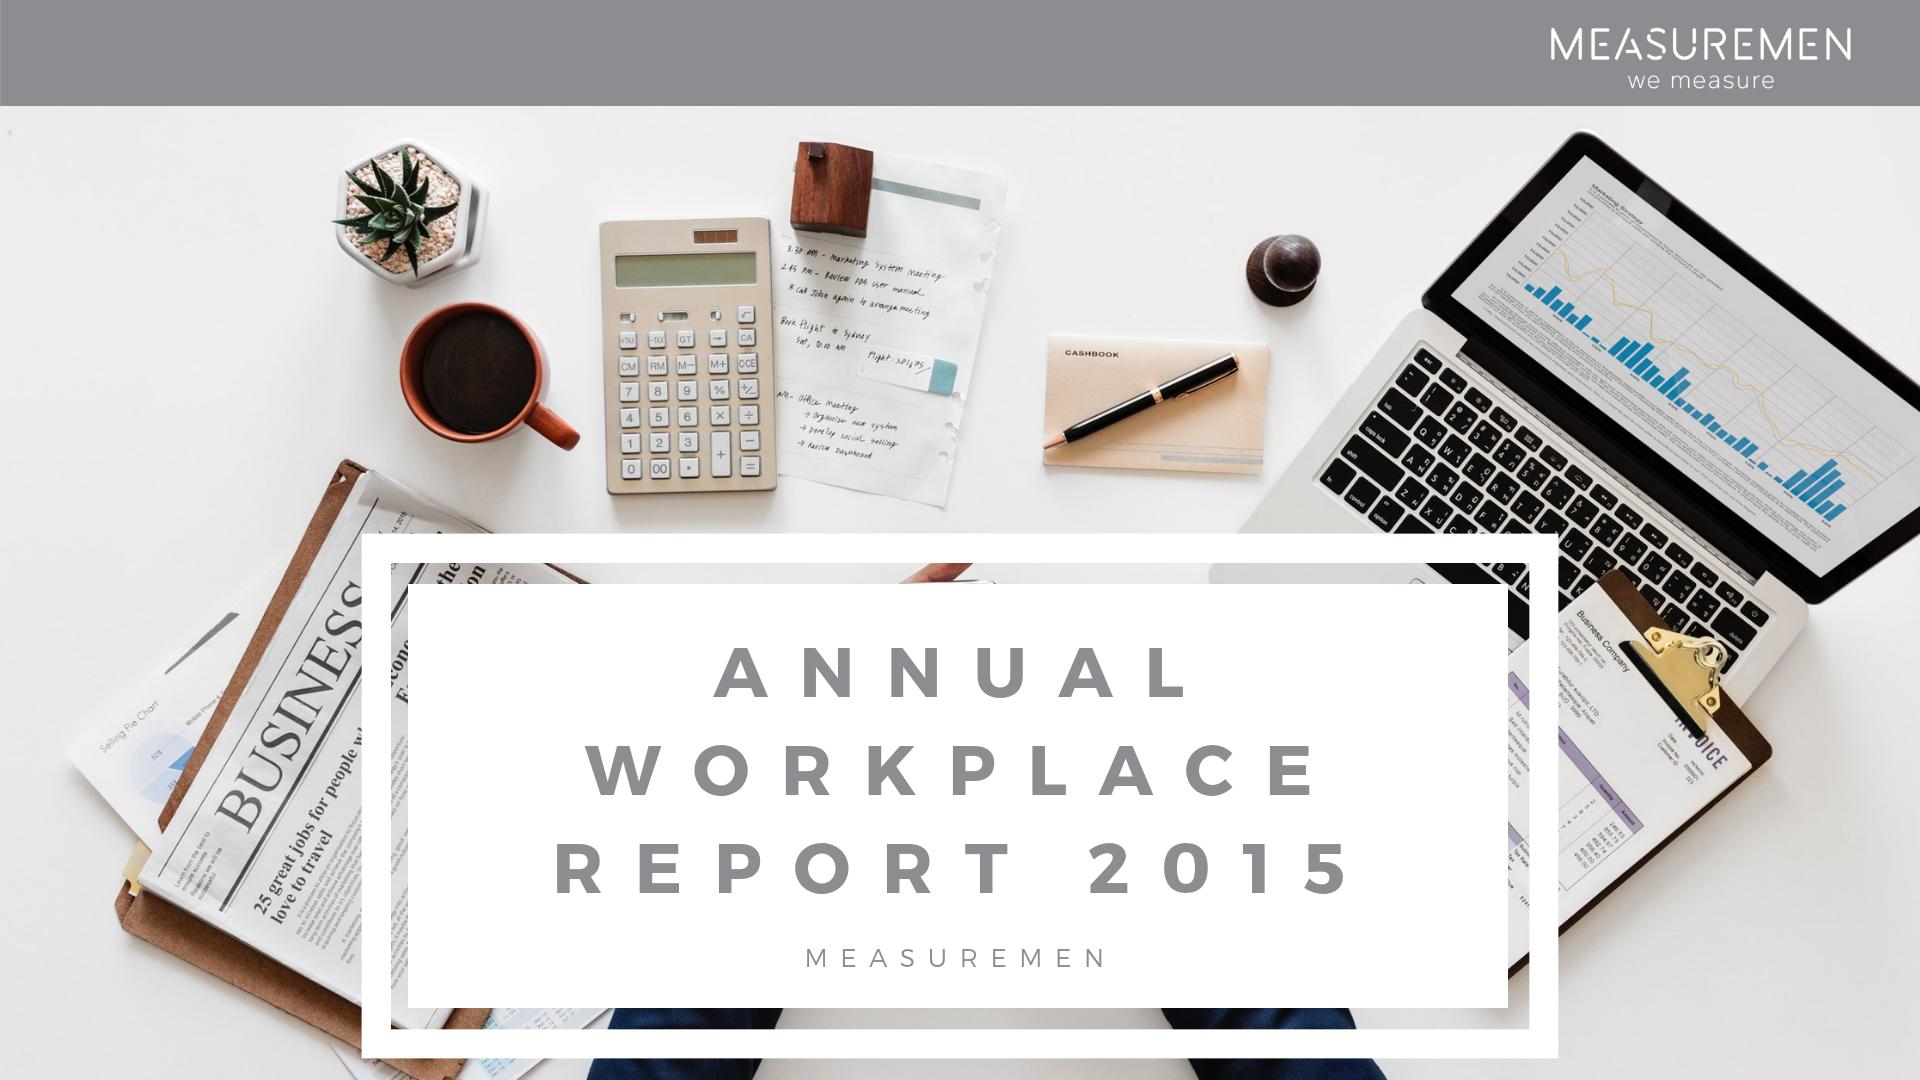 Measuremen Annual Workplace Report 2015